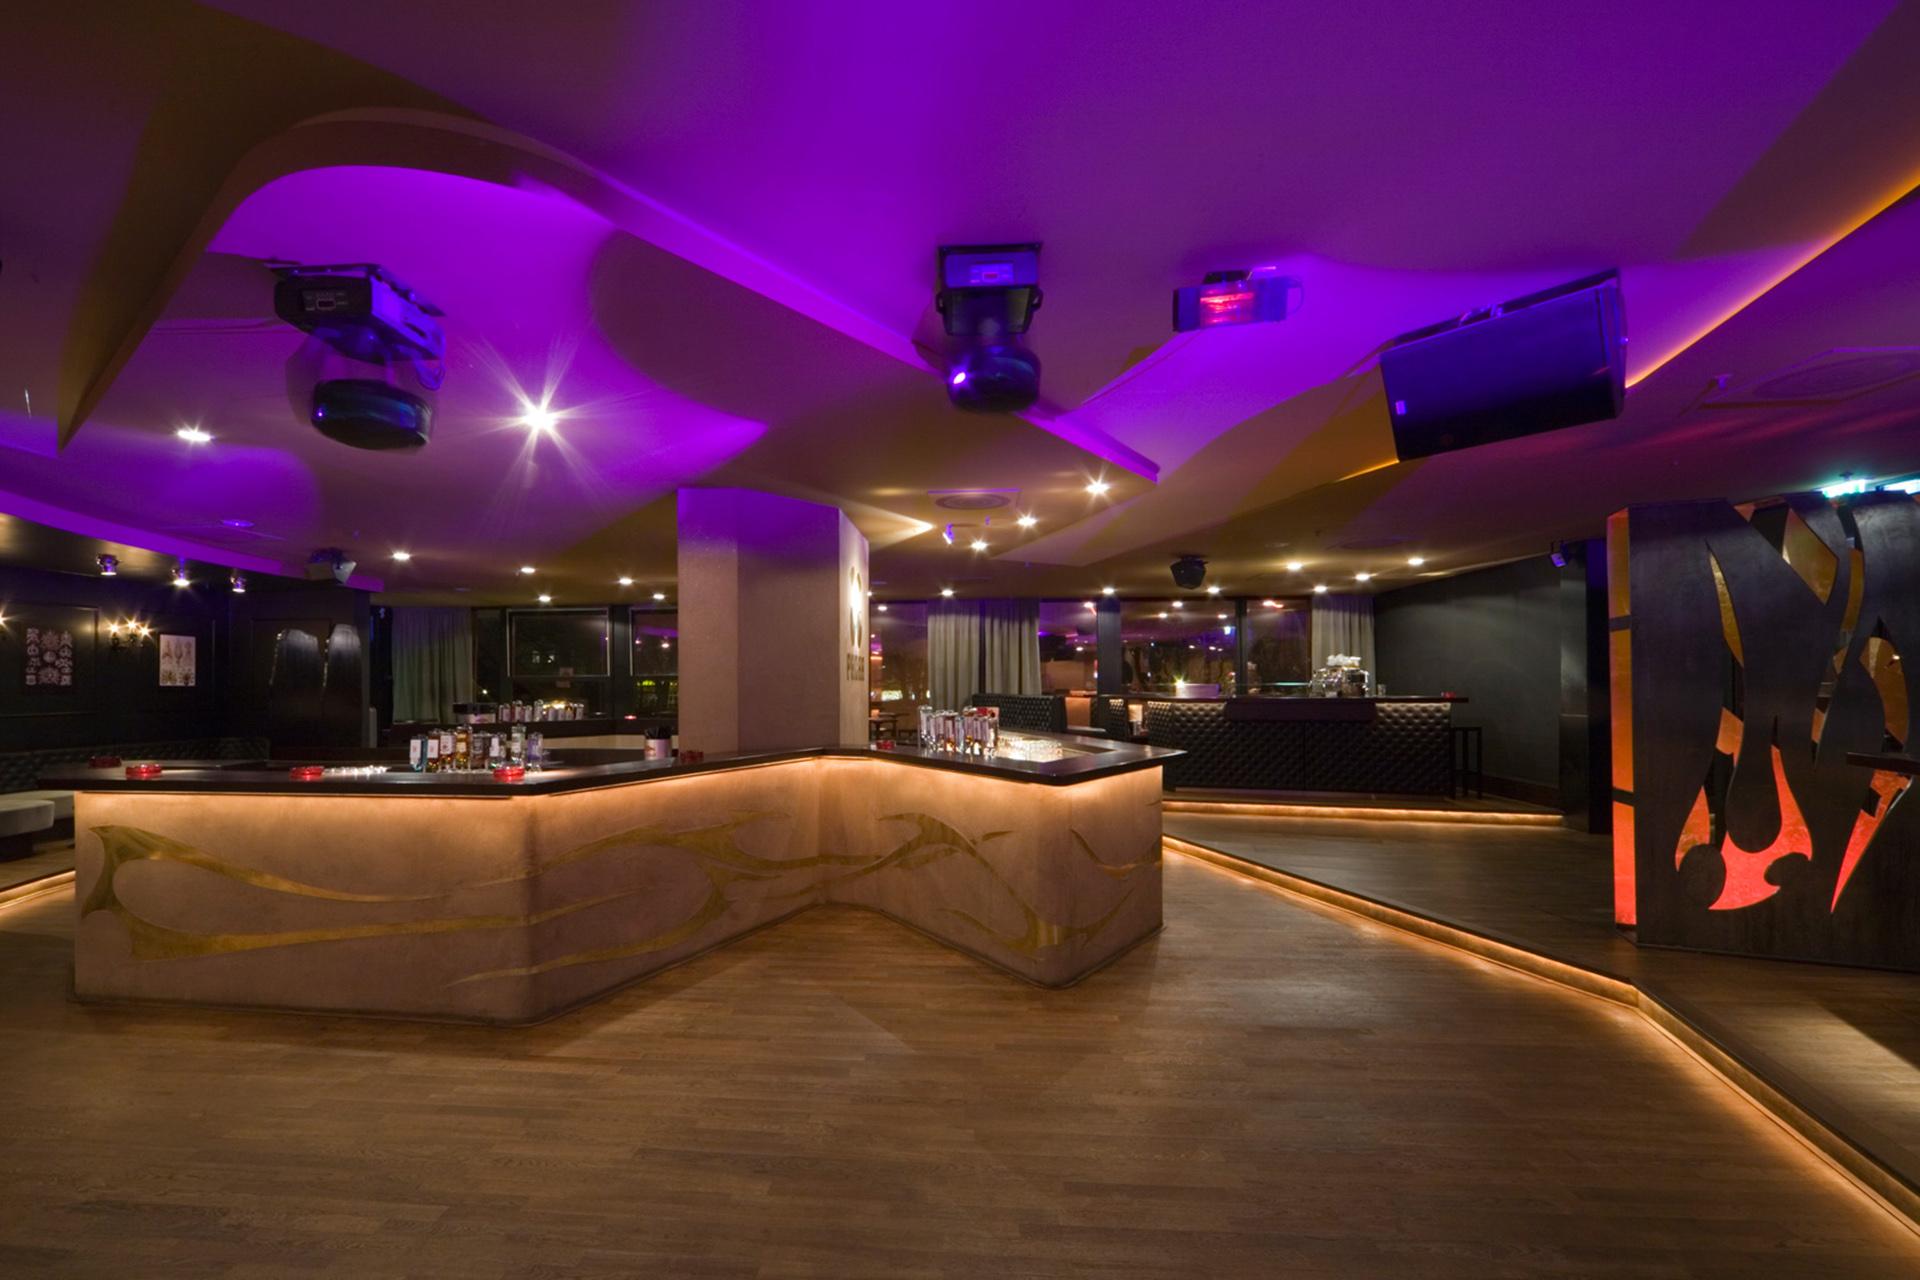 006-interior-design-hospitality-night-club-bar-pacha-muenchen-buero-philipp-moeller.jpg